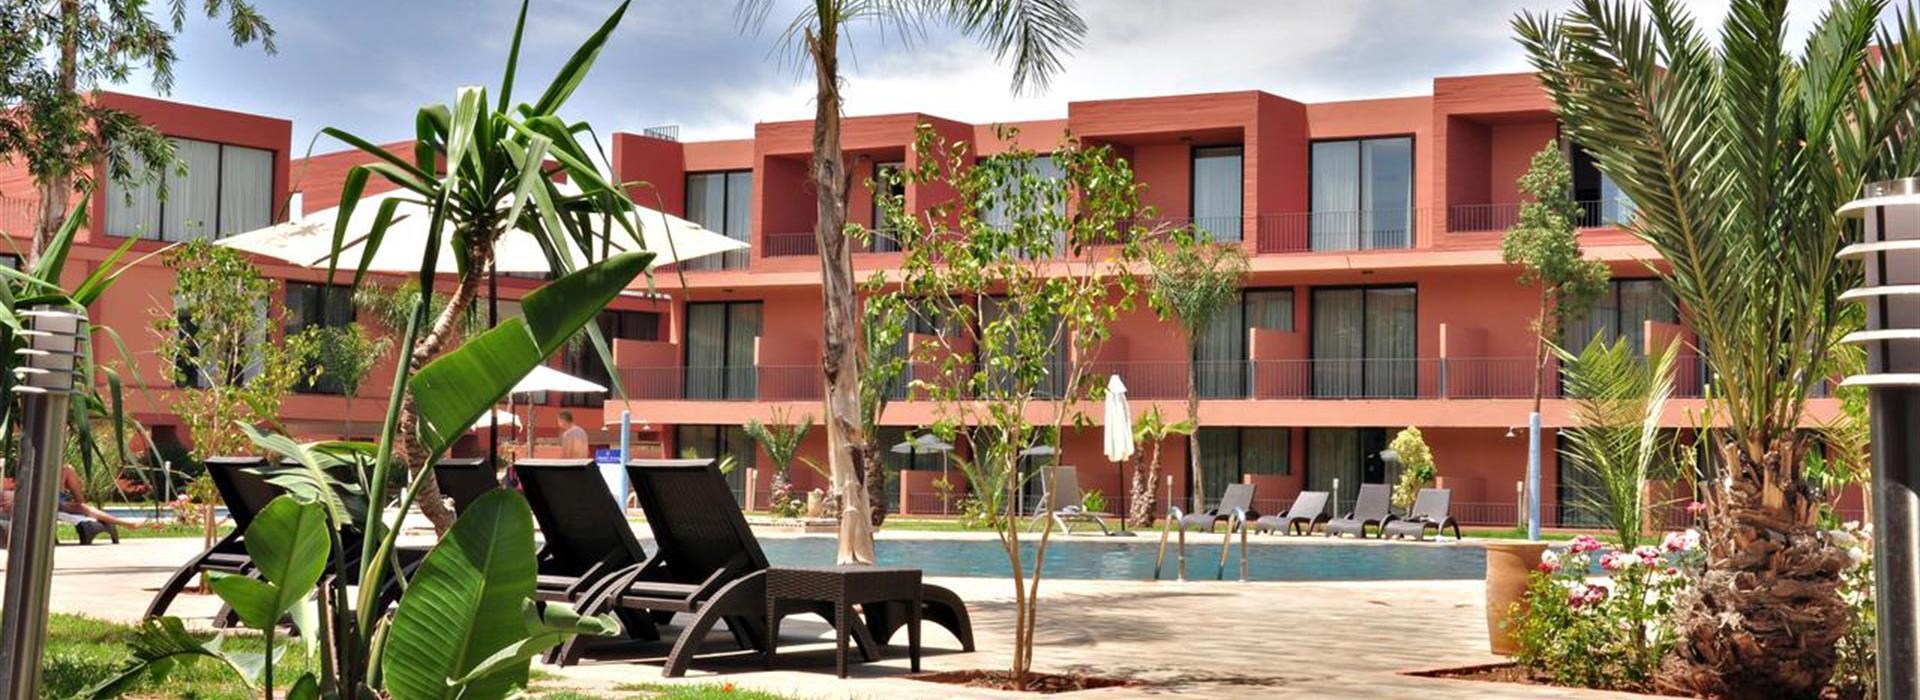 rawabi-hotel-and-spa